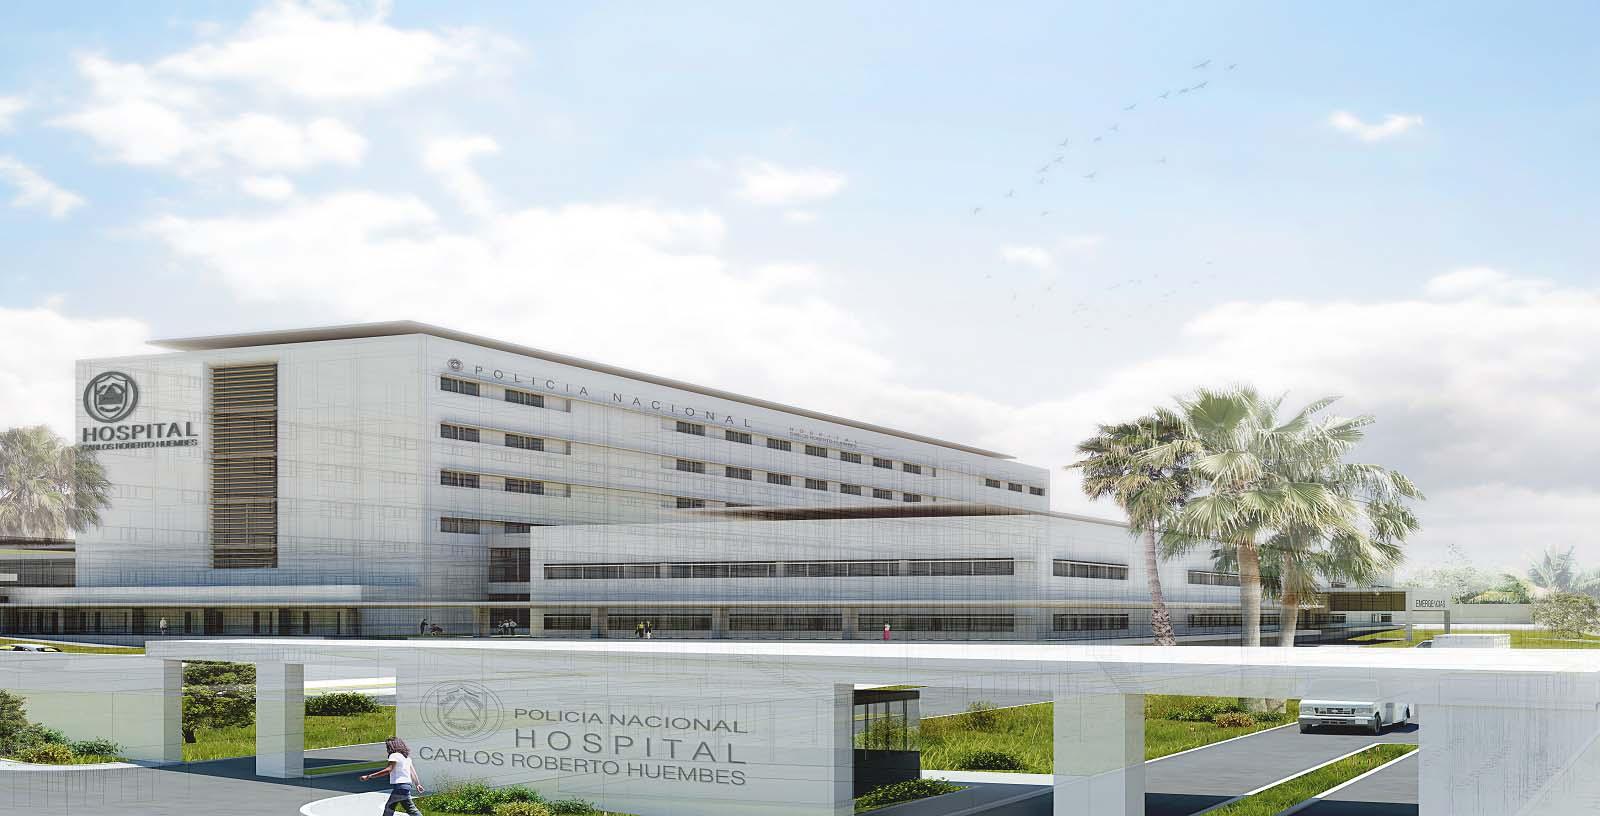 C.R.Huembes_Hospital_Nicaragua_04_Architecture_IDOM_Copyright_1